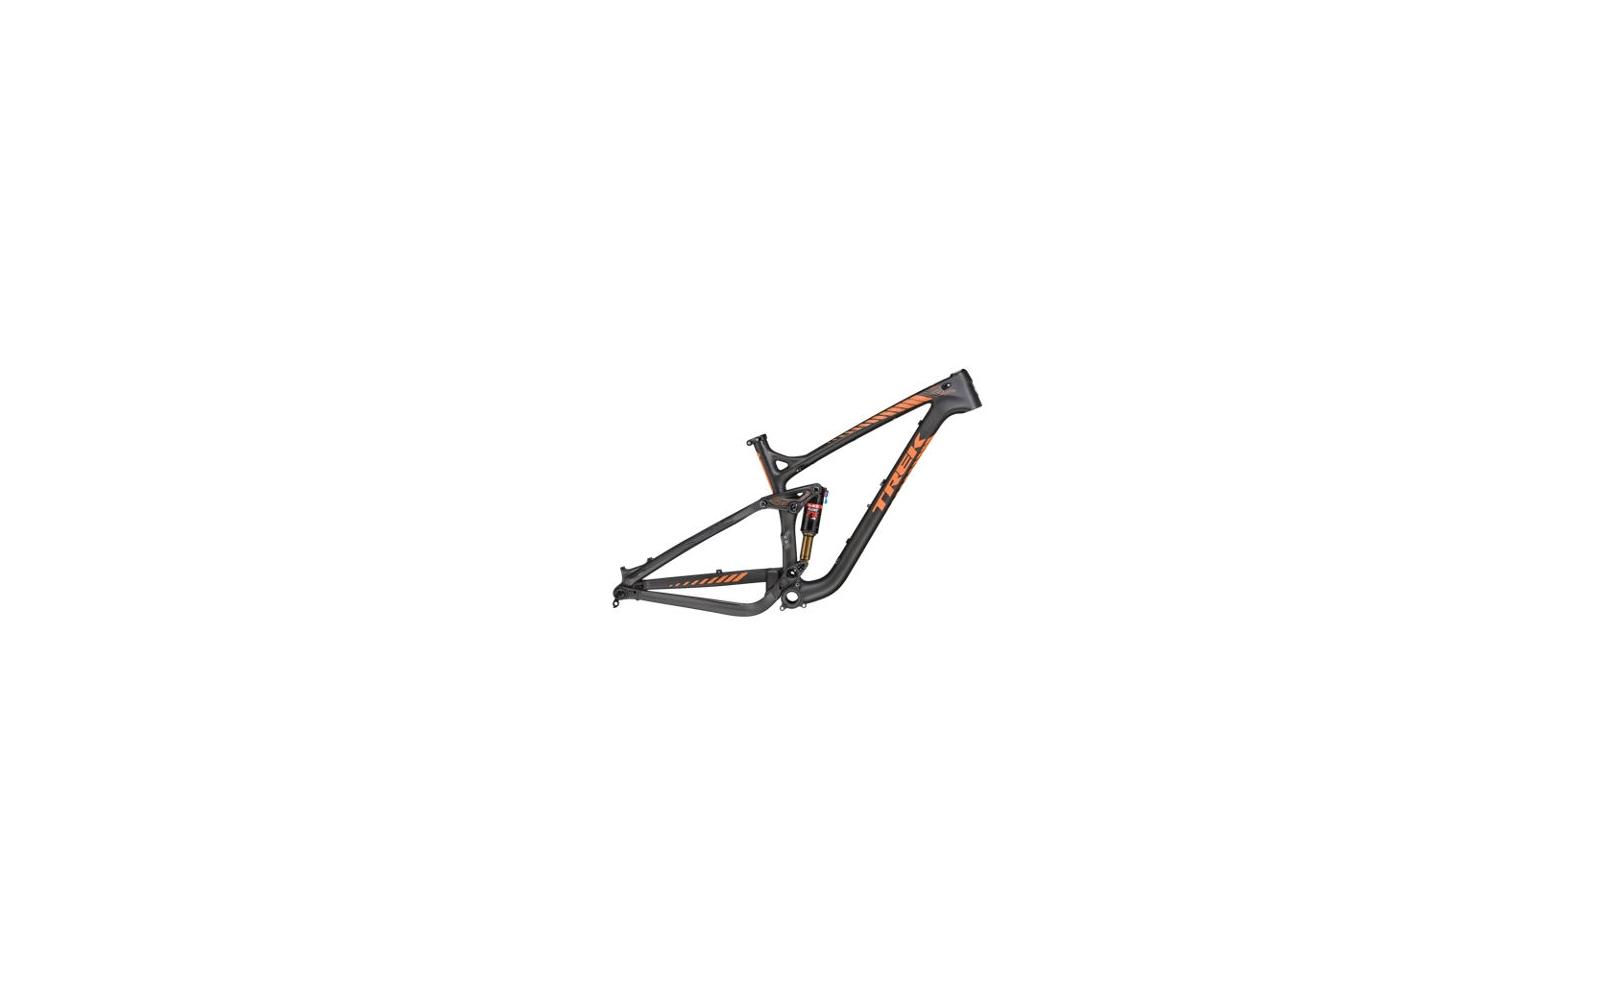 Trek Remedy Frameset 27.5 C F/S Mountainbike Rahmen Hardtail Fully 2016